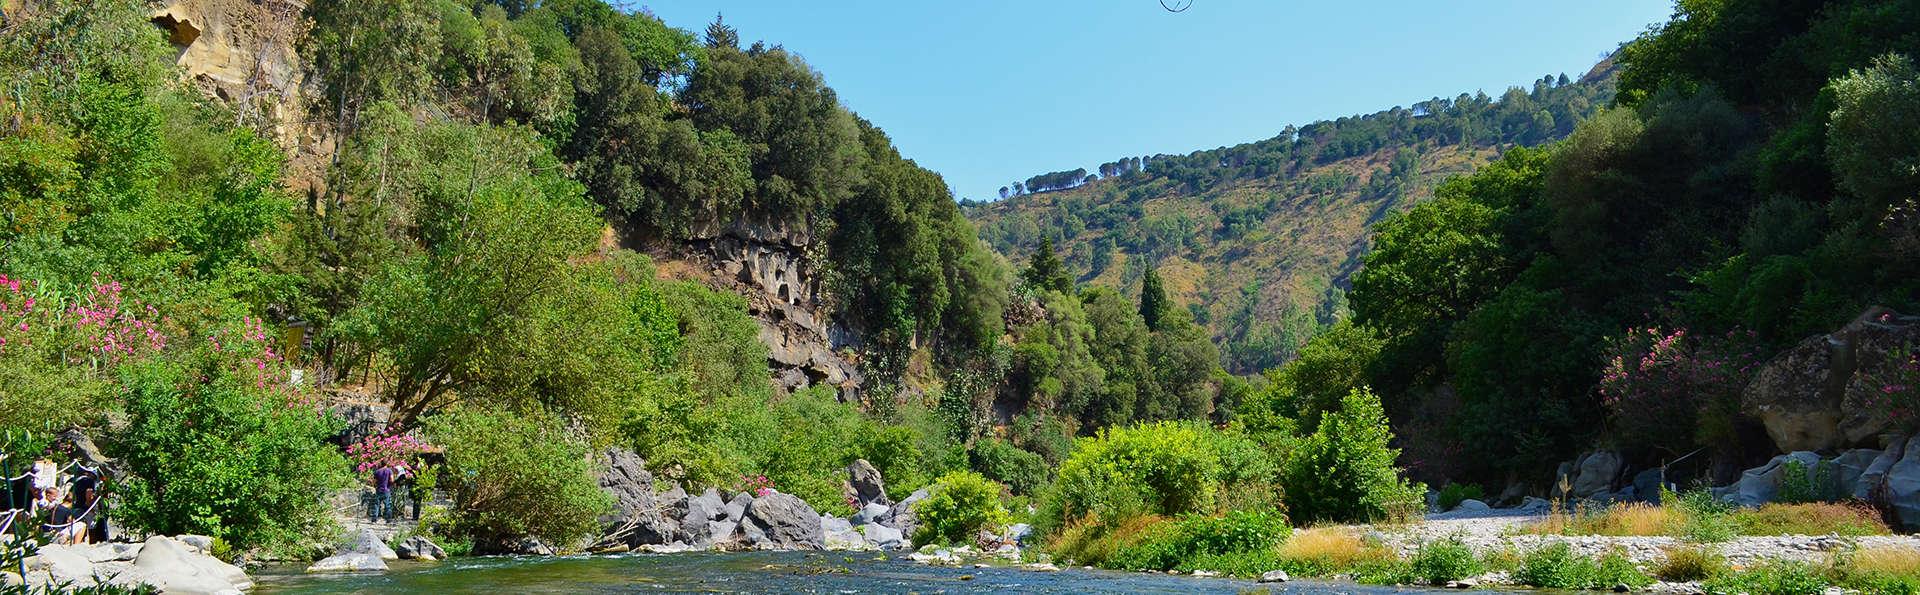 Mareneve Resort - edit_Fotolia_54295702_river-near-to-etna.jpg